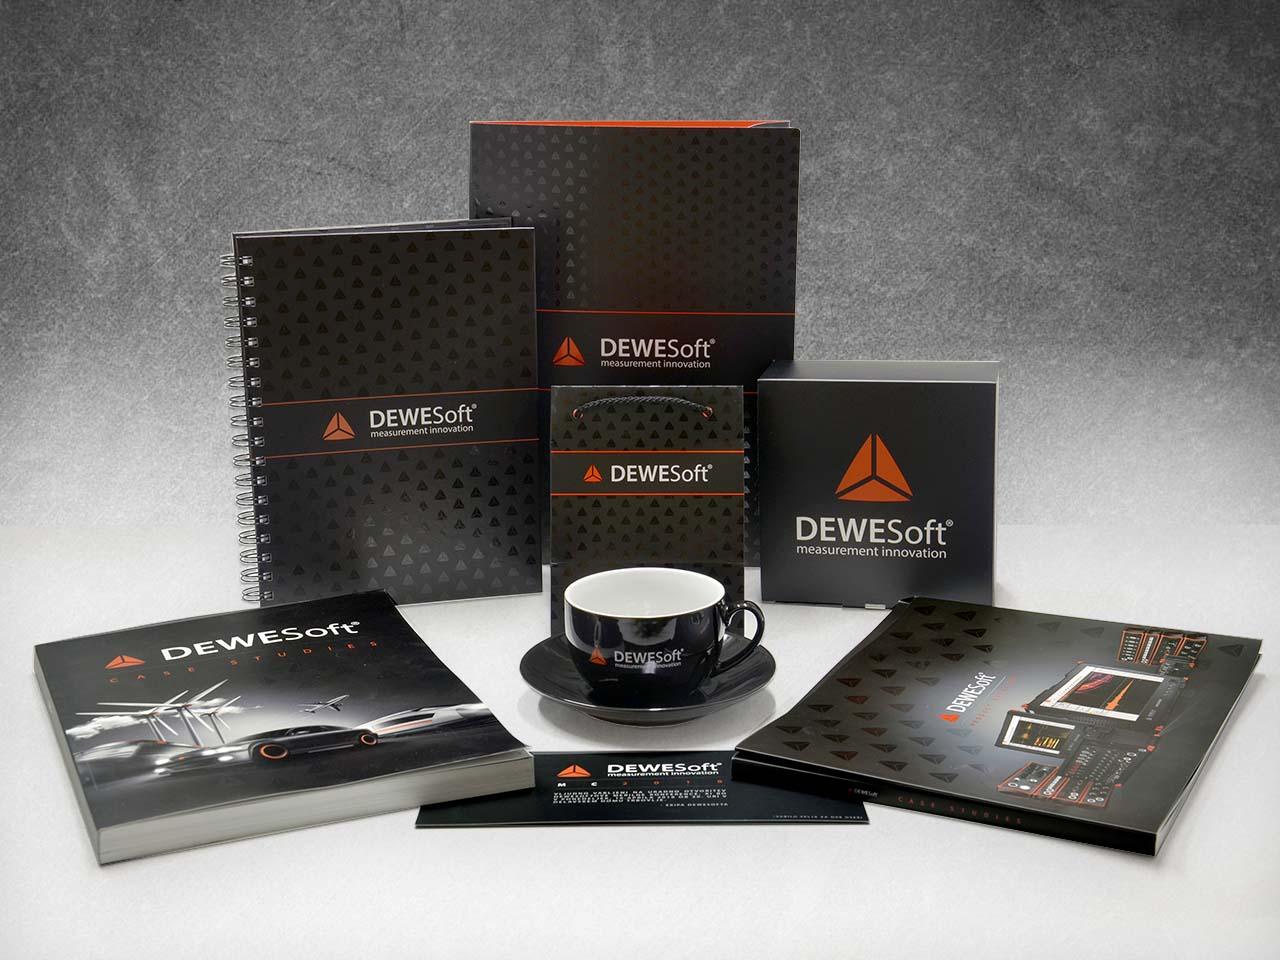 Comprehensive solutions - Dewesoft